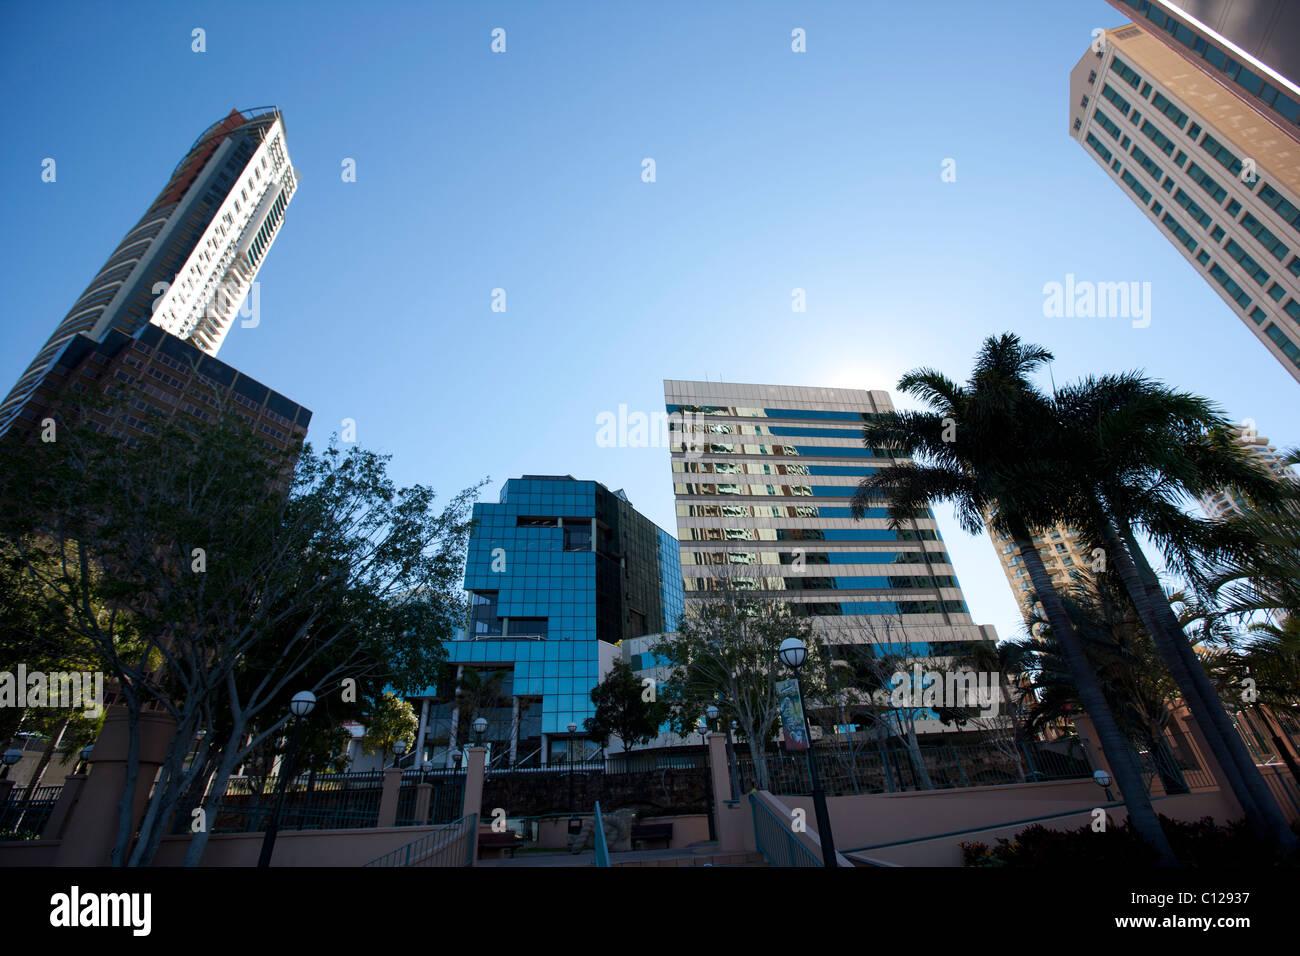 Brisbane CBD. - Stock Image